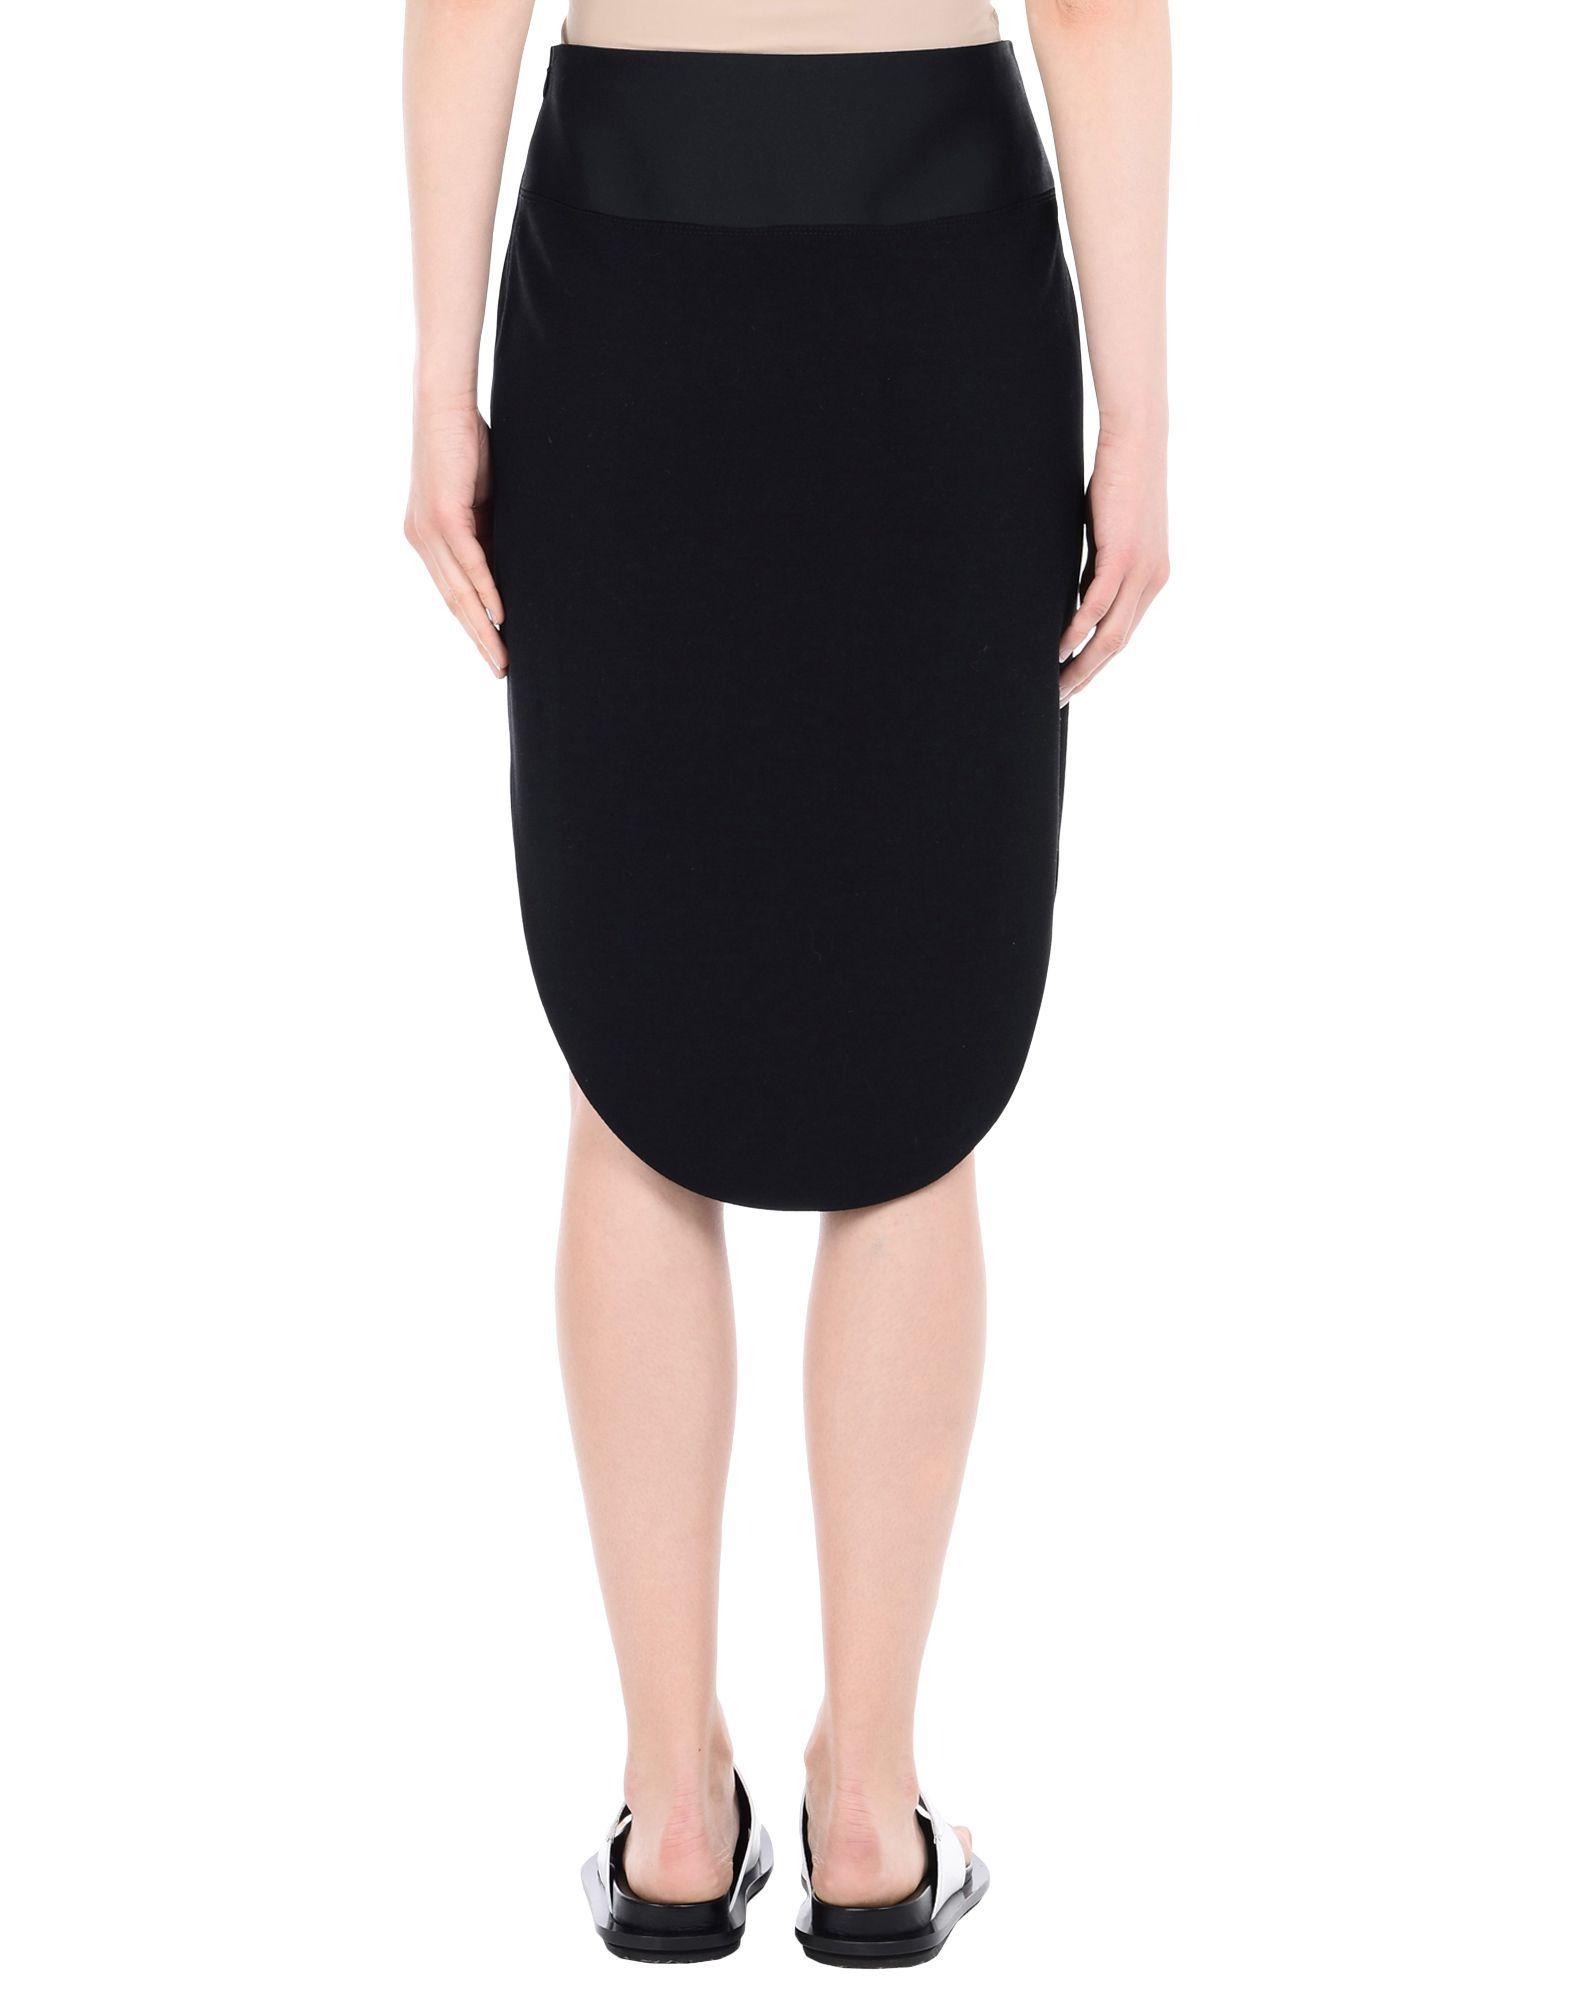 Skirt Maiyet Black Women's Viscose